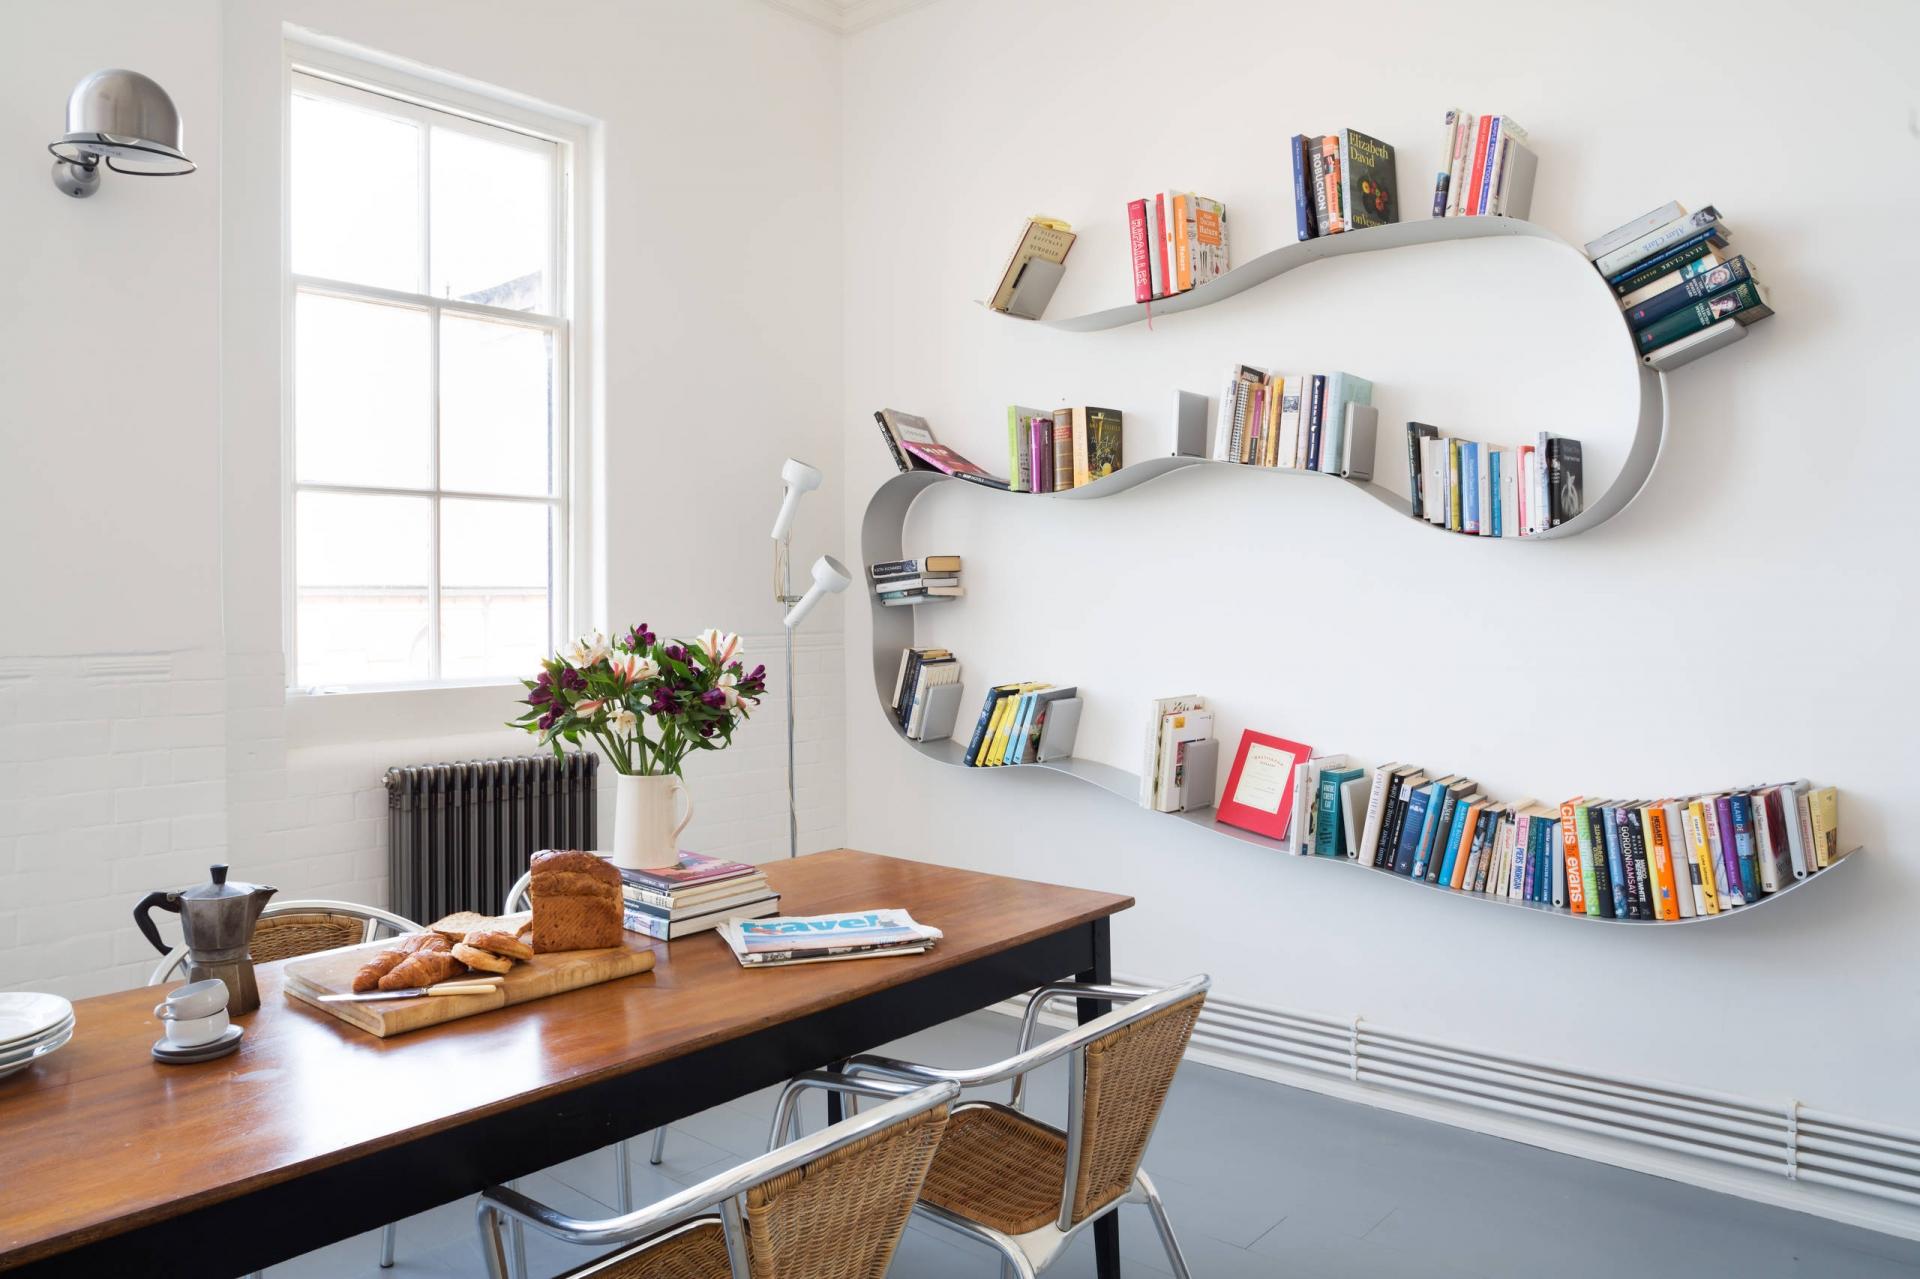 bookshelf ideas 6. set on a curve JGMACUO